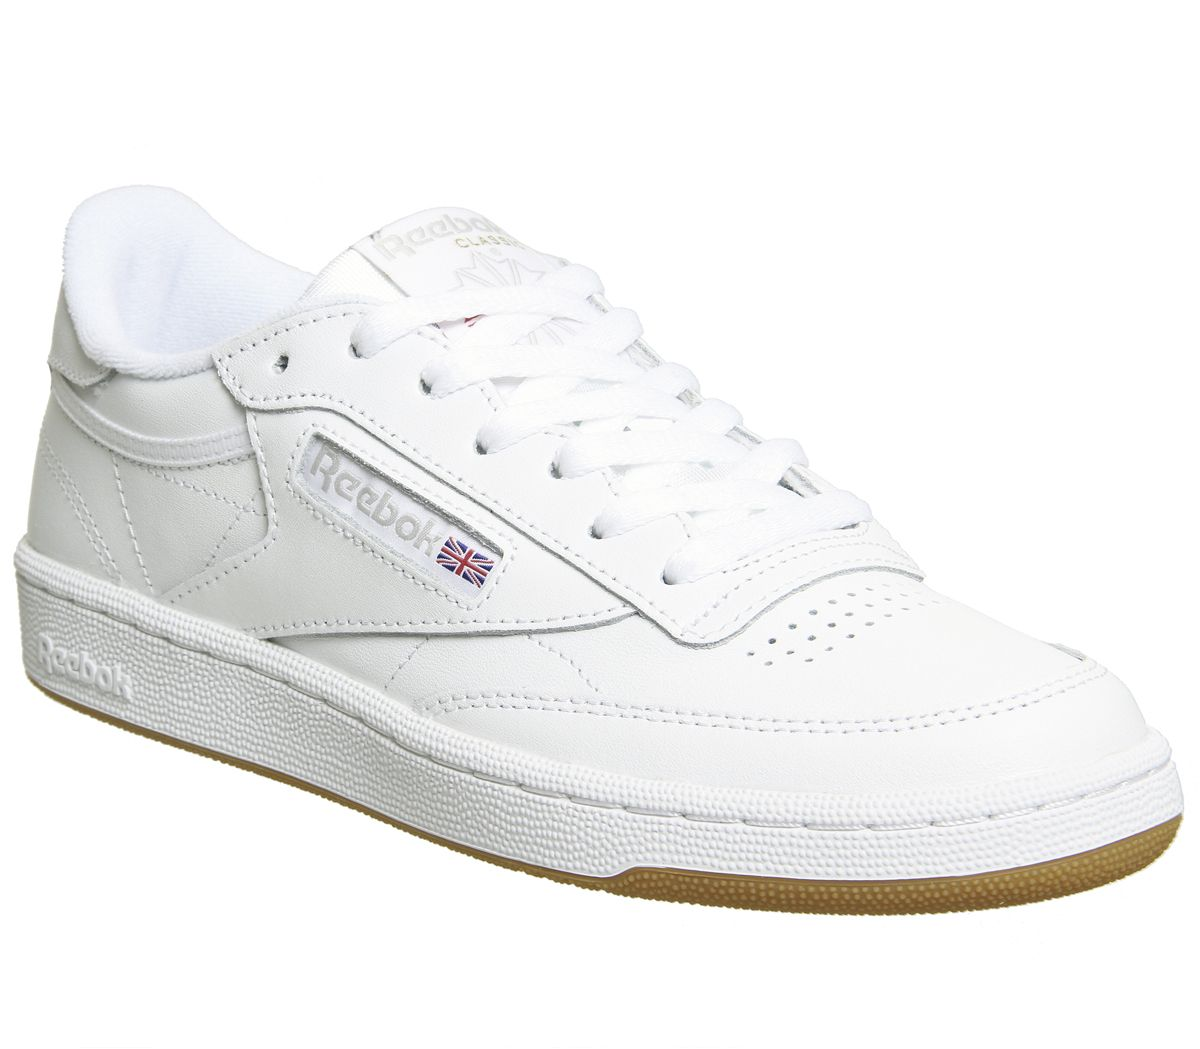 blanche sole classic leather gum reebok trainers oeQdxWrCBE